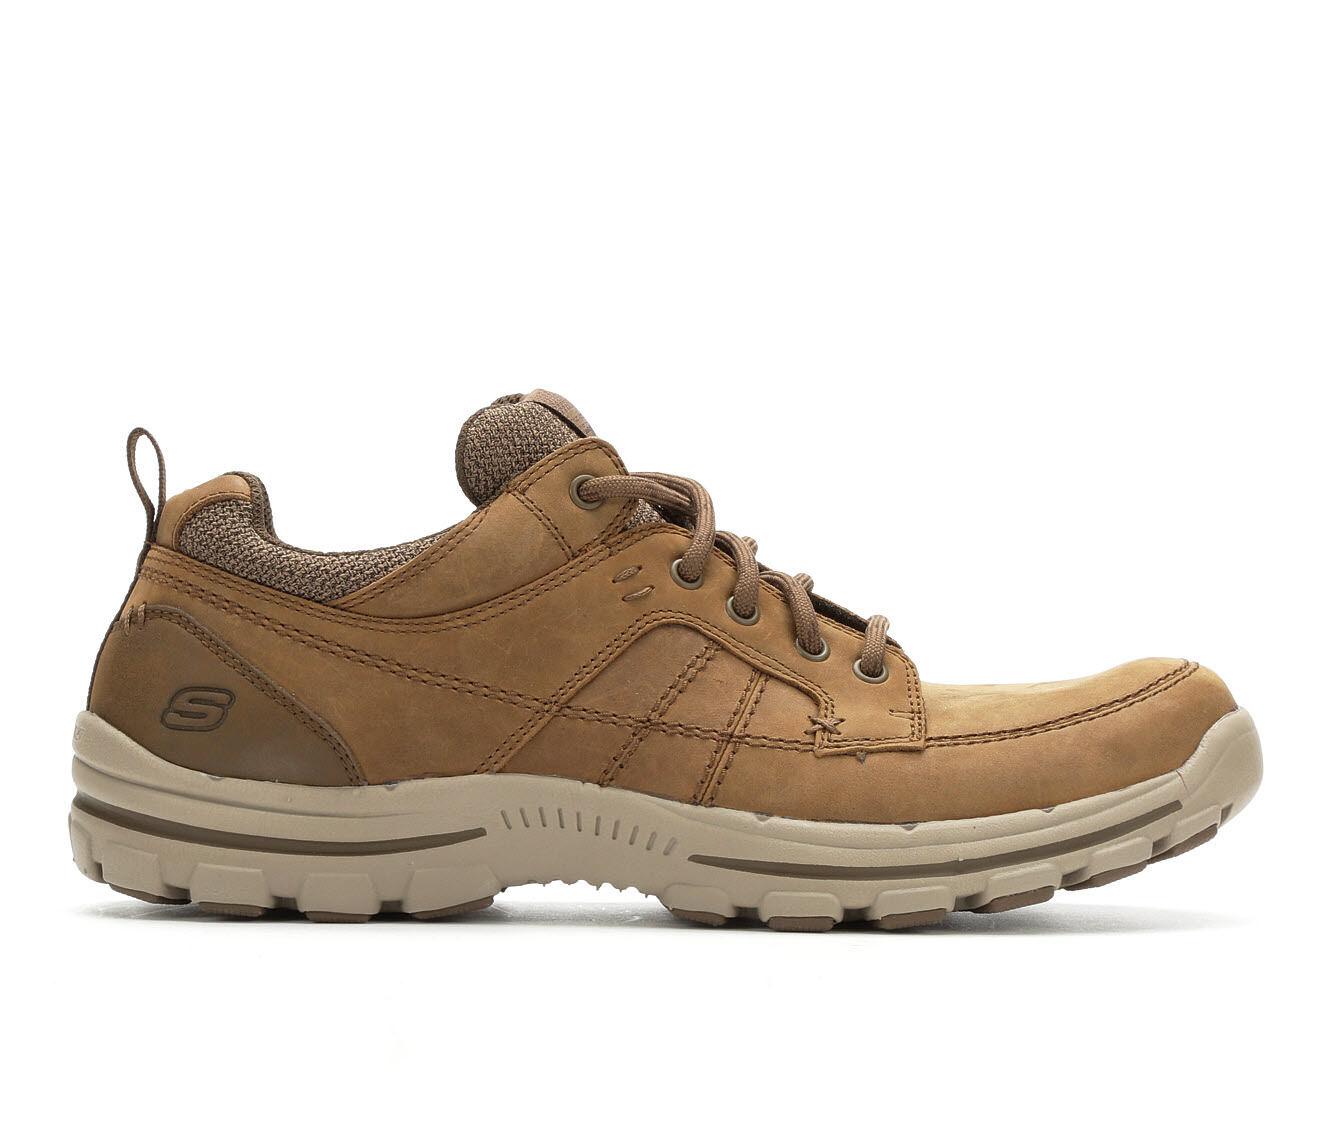 uk shoes_kd1428